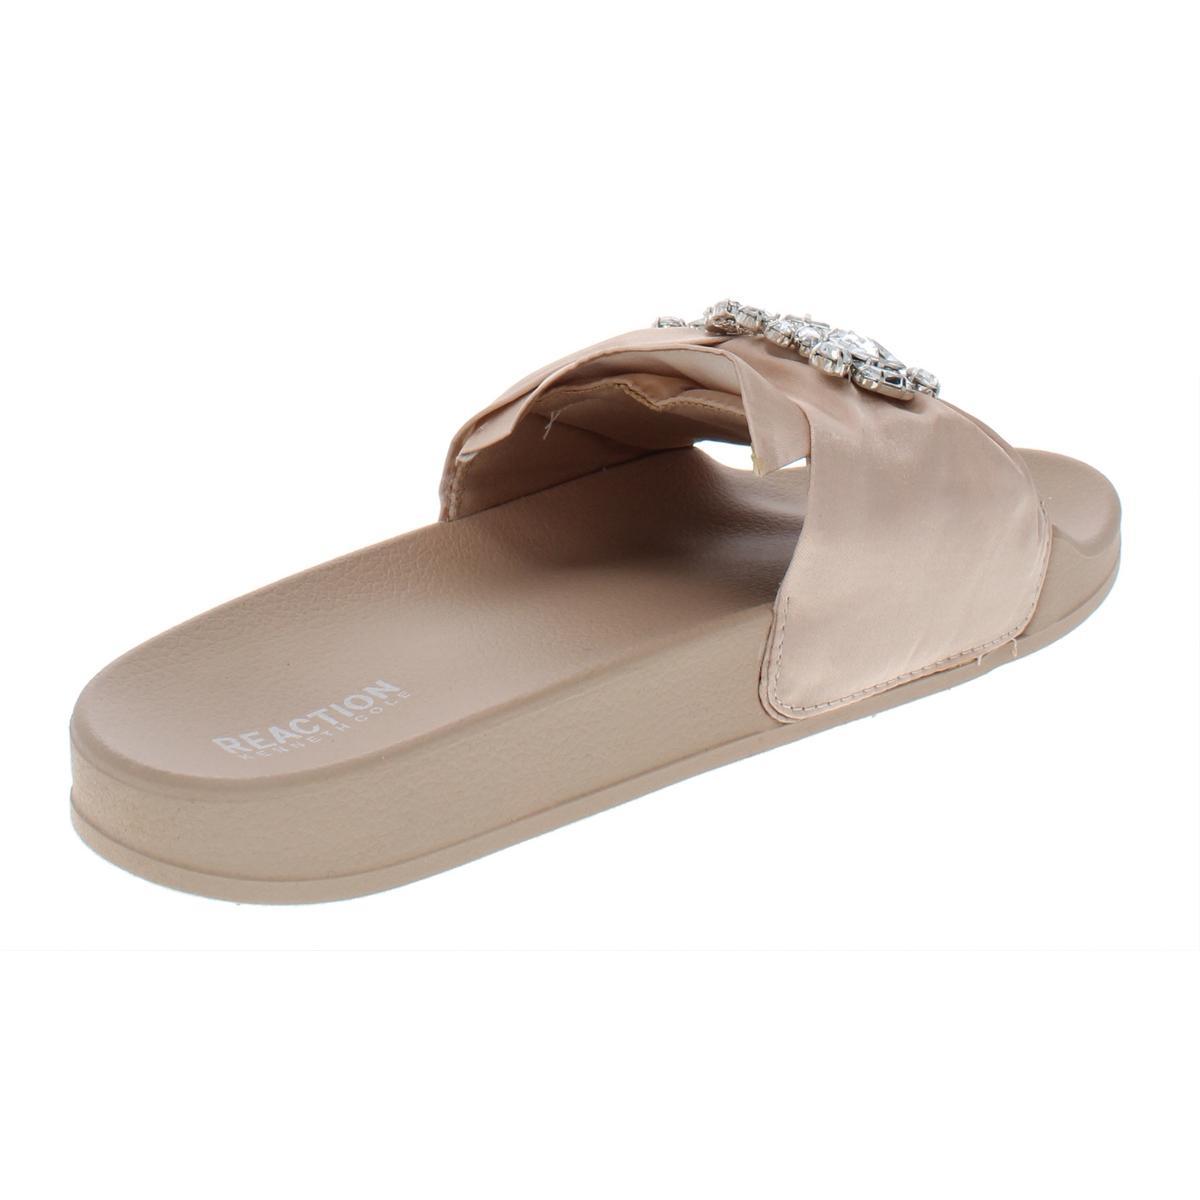 Kenneth-Cole-Reaction-Womens-Pool-Jewel-Satin-Slide-Sandals-Flats-BHFO-7076 thumbnail 4